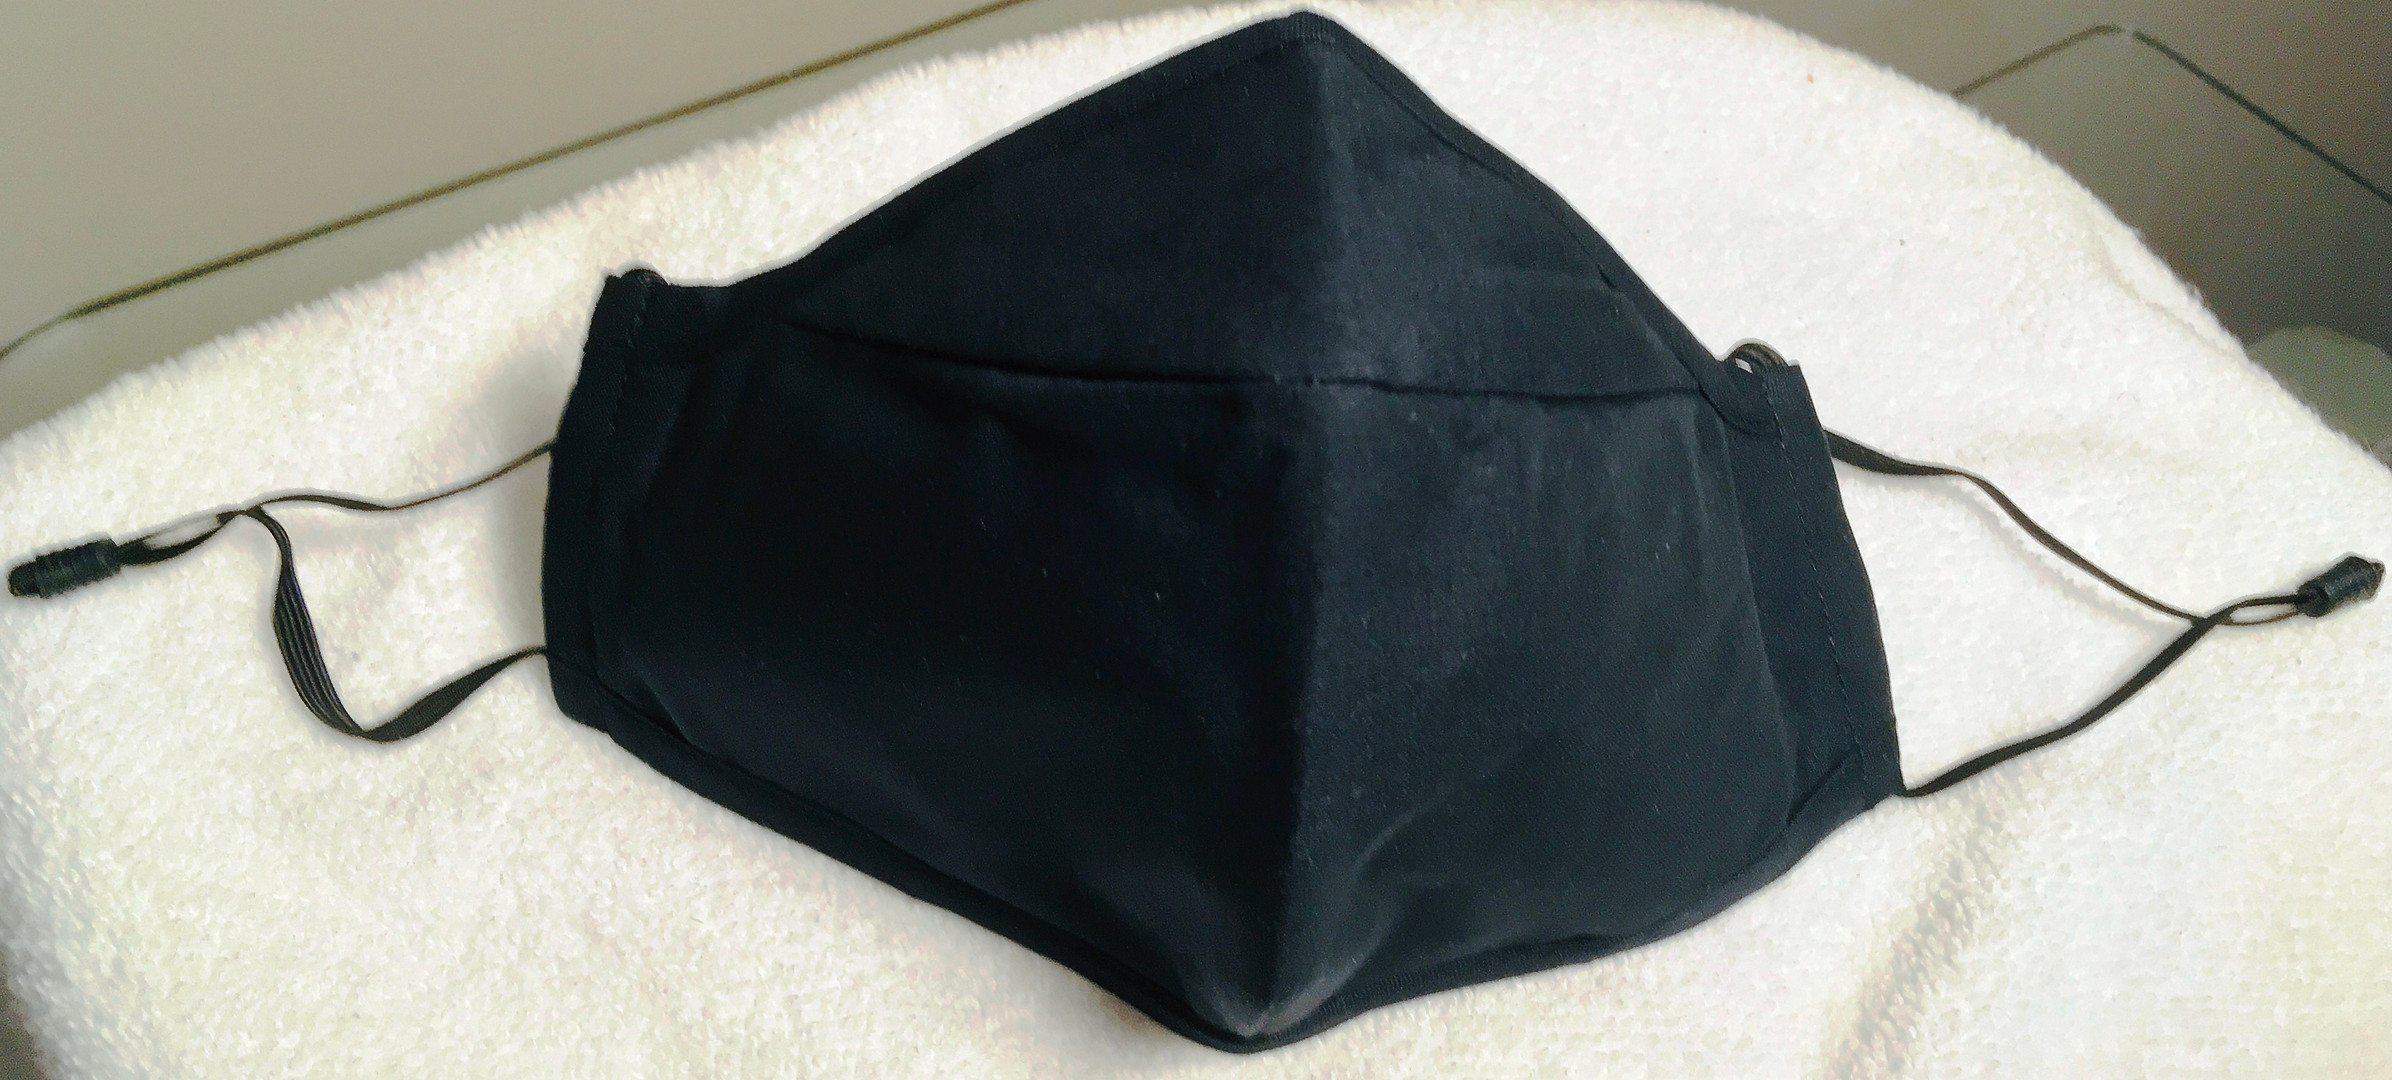 Unisex Black Copper Infused Mask